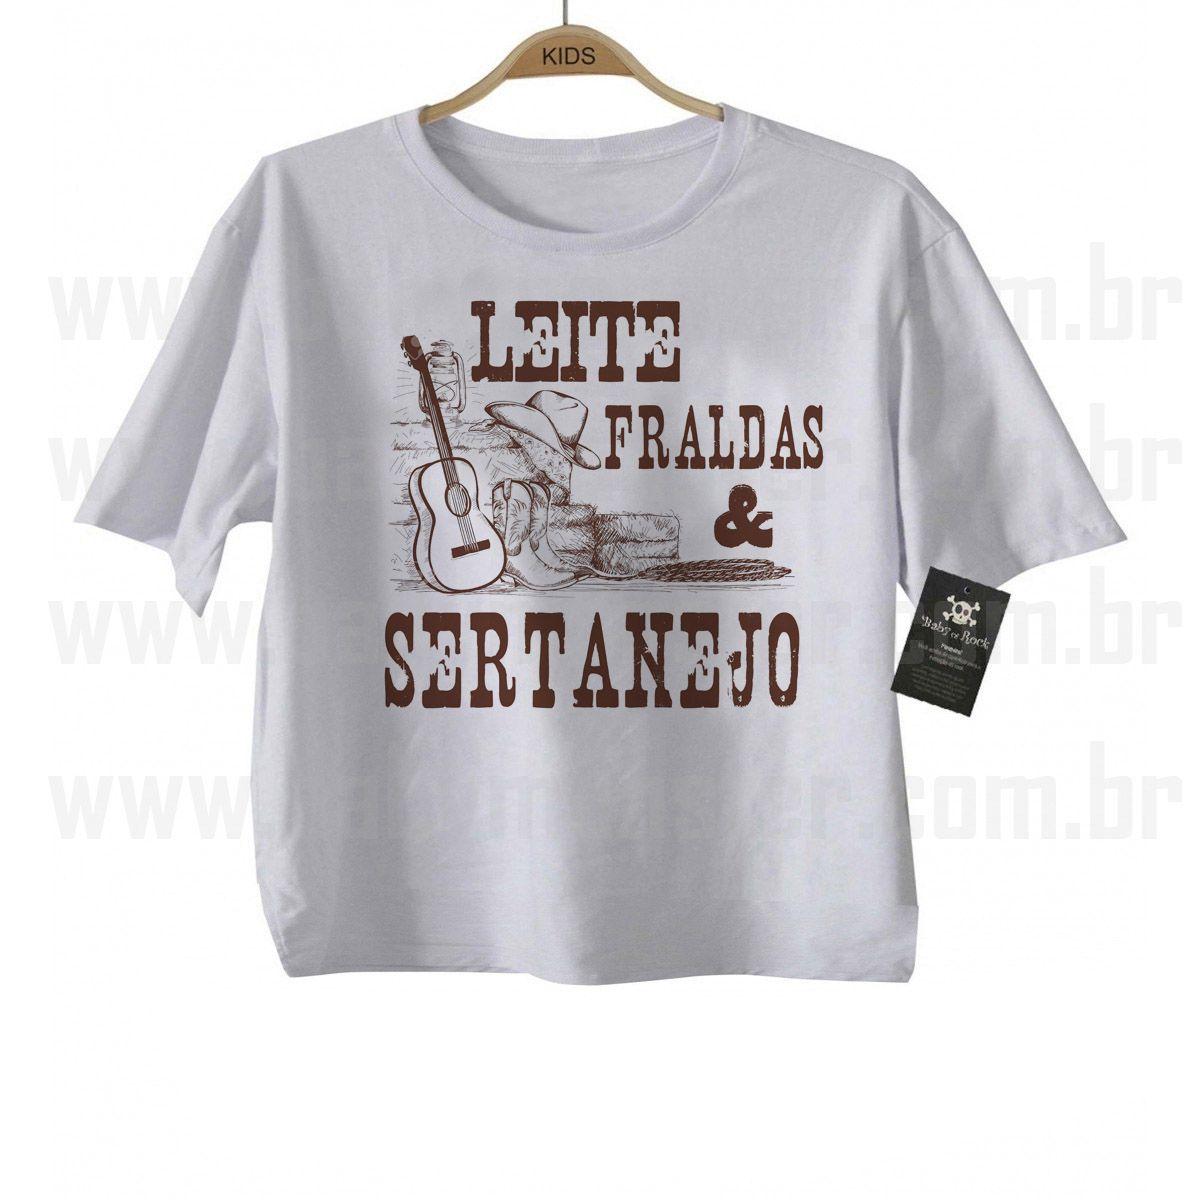 Camiseta Sertanejo Leite Fraldas e Sertanejo - White  - Baby Monster S/A